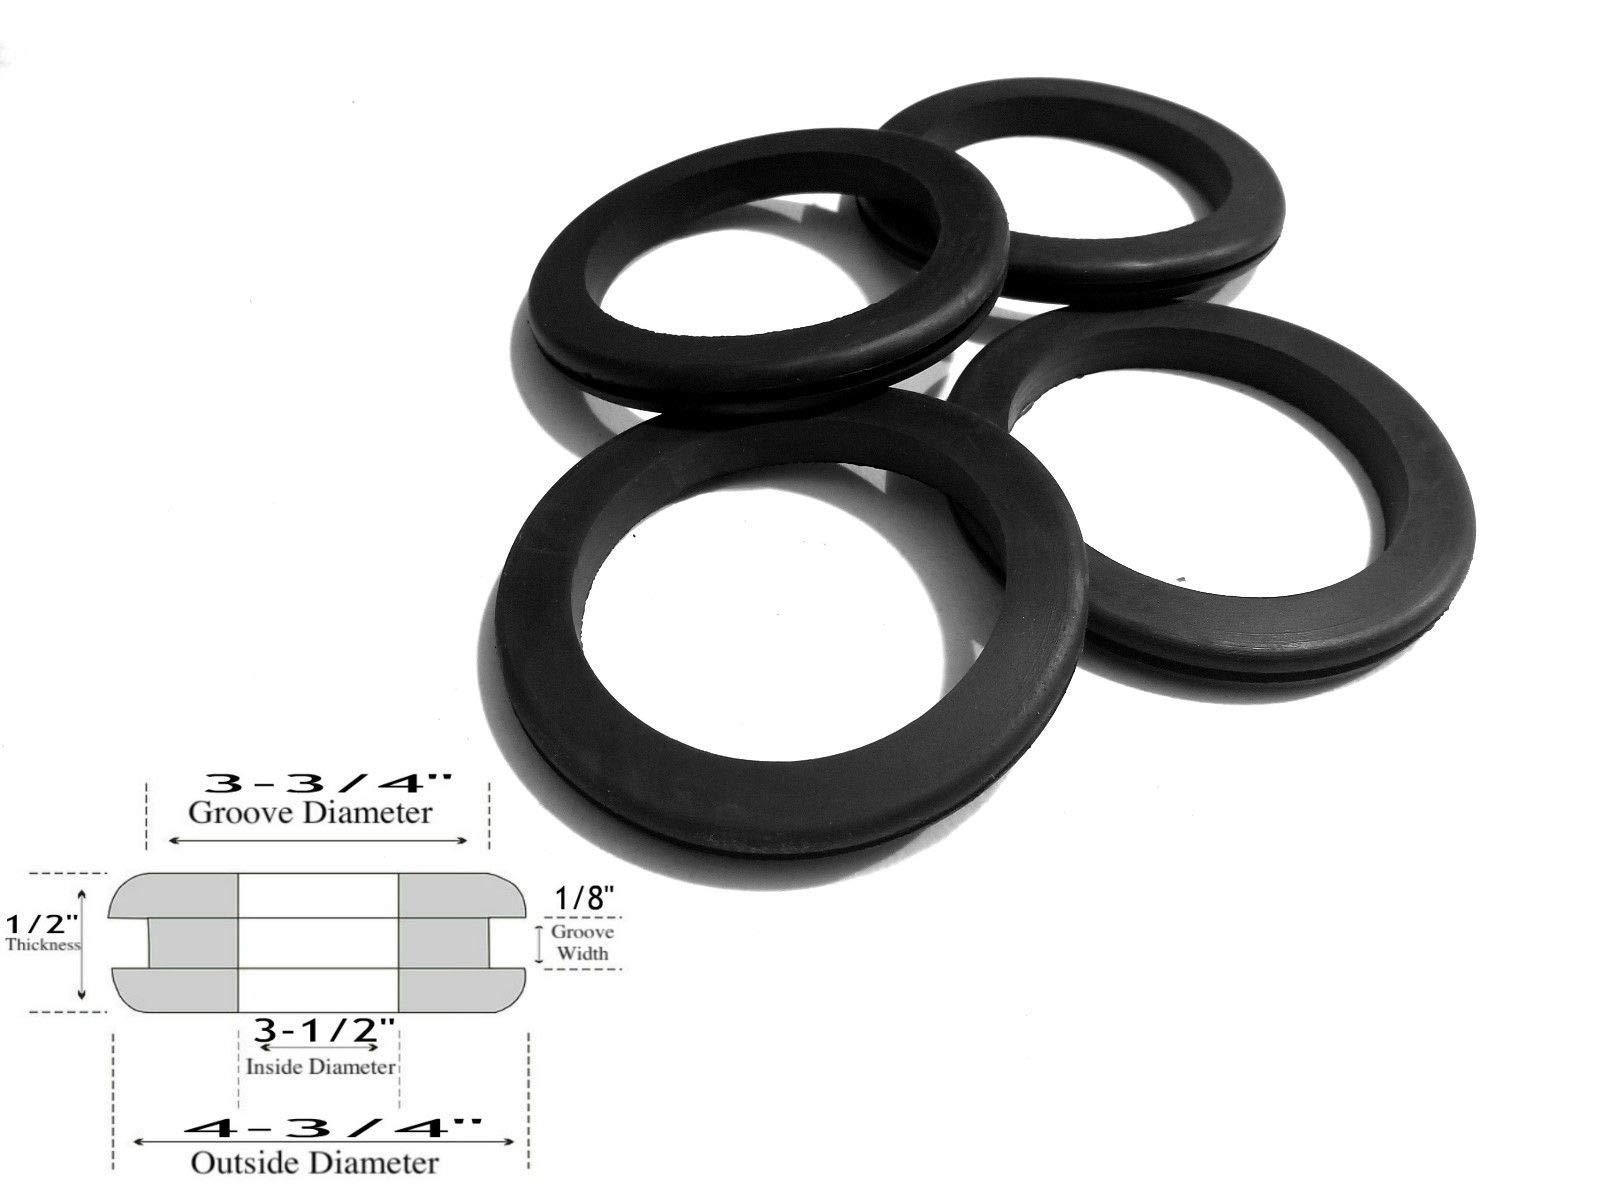 Lot of 4 Rubber Grommets: 3-1/2'' Inside Diameter - 1/8'' Groove Width - Fits 3-3/4'' Panel Hole